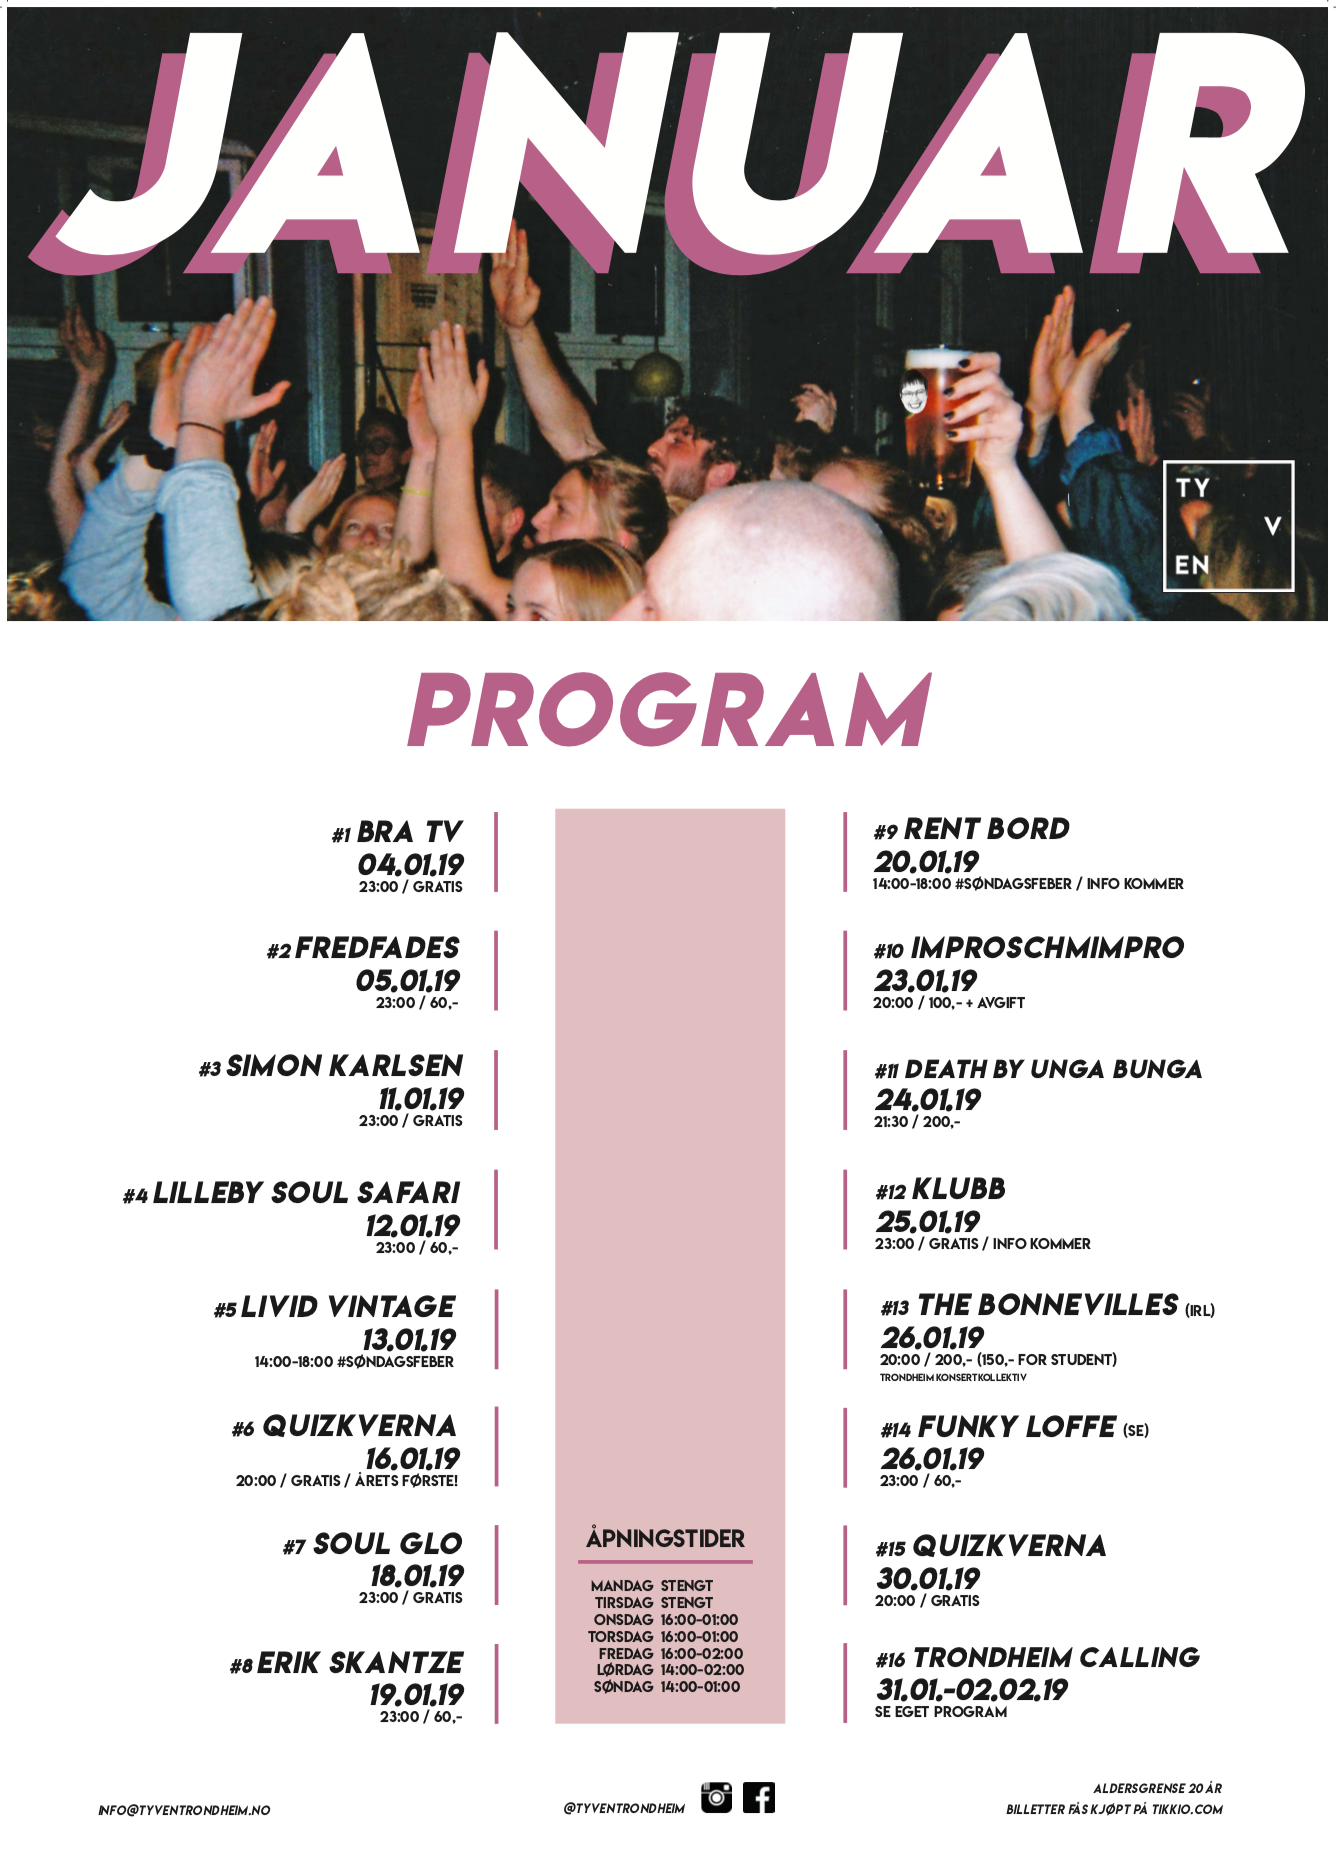 JANUAR program.png